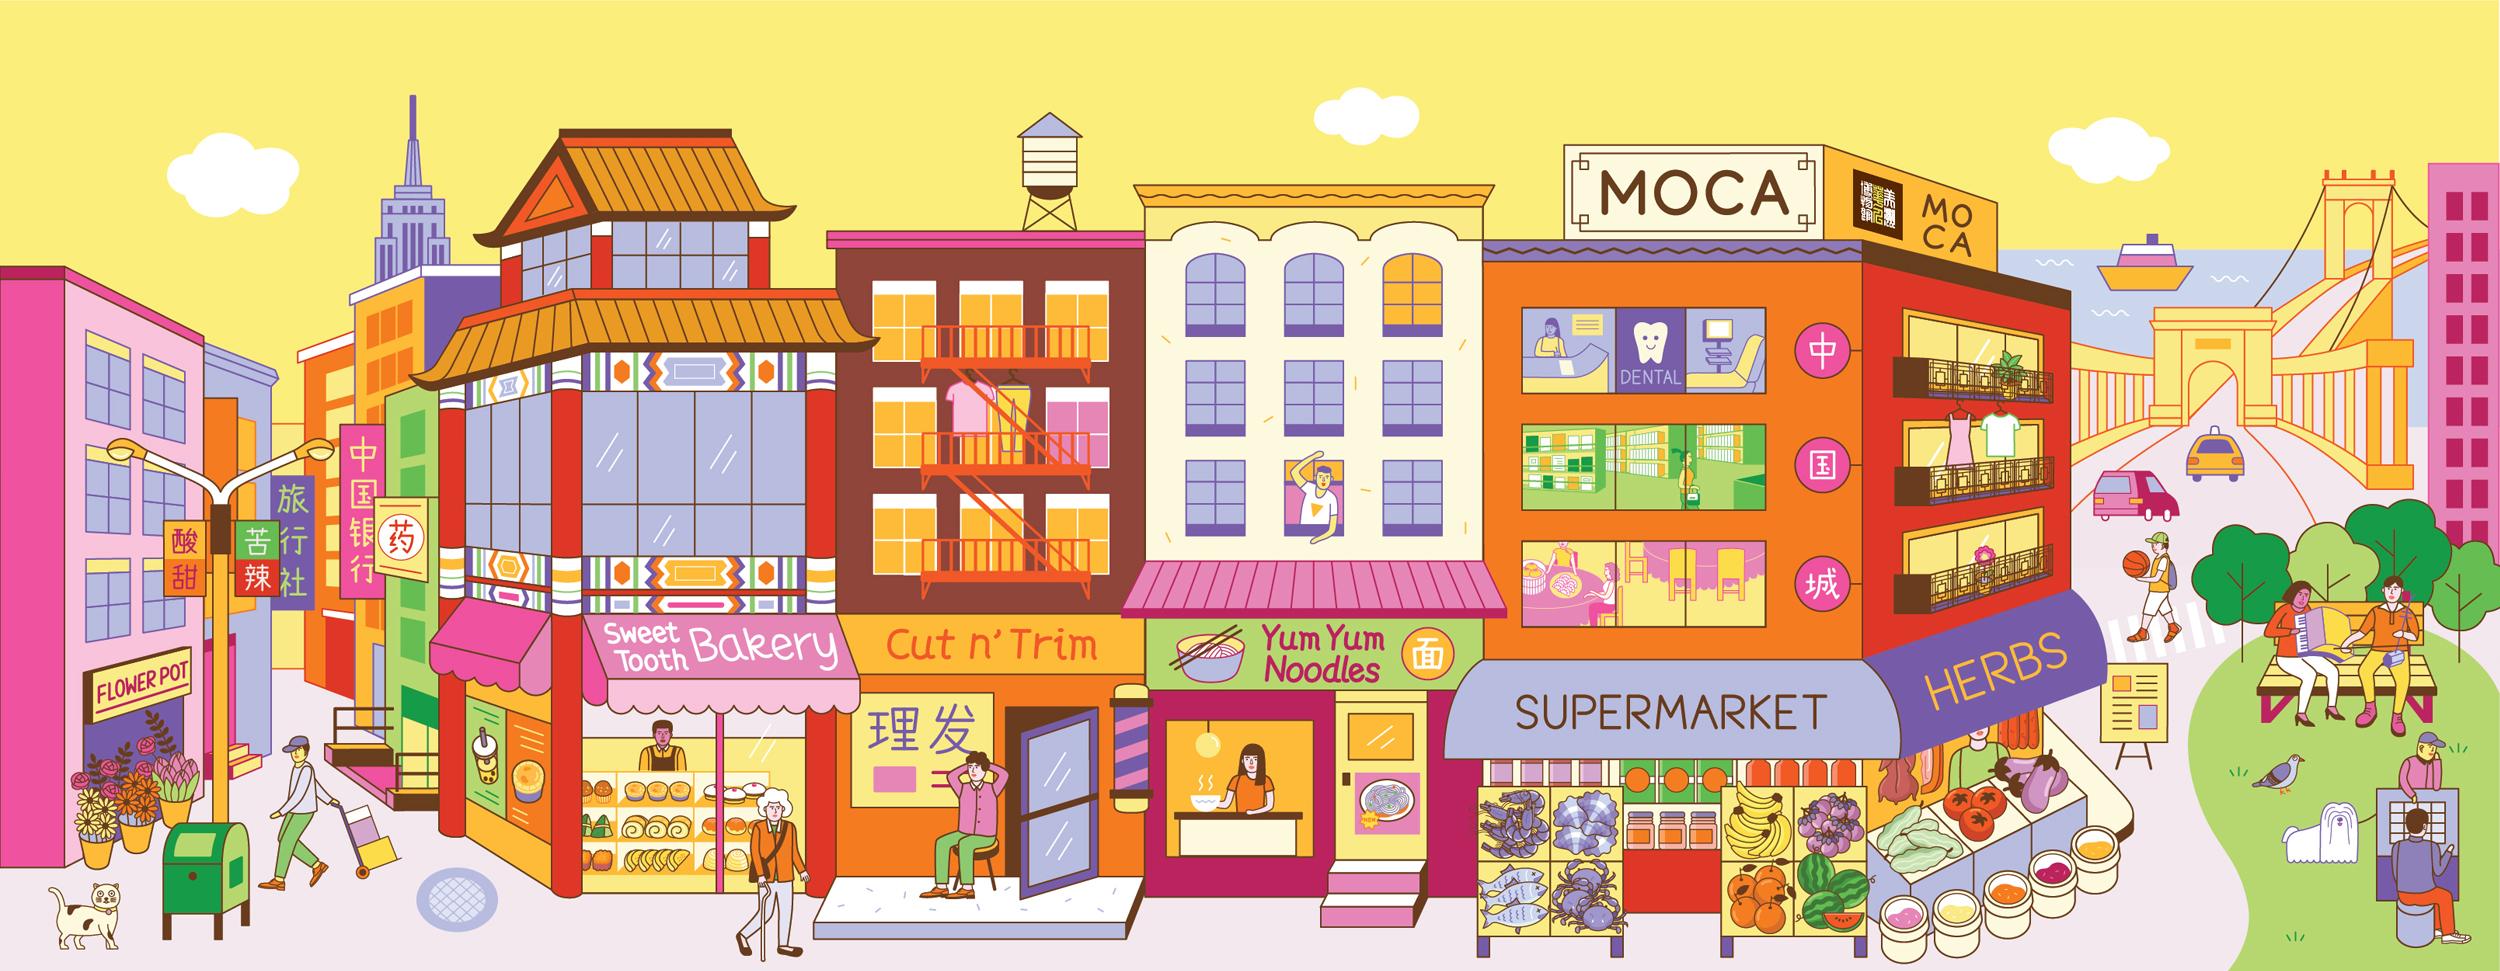 Chinatown_Website_C_02.jpg